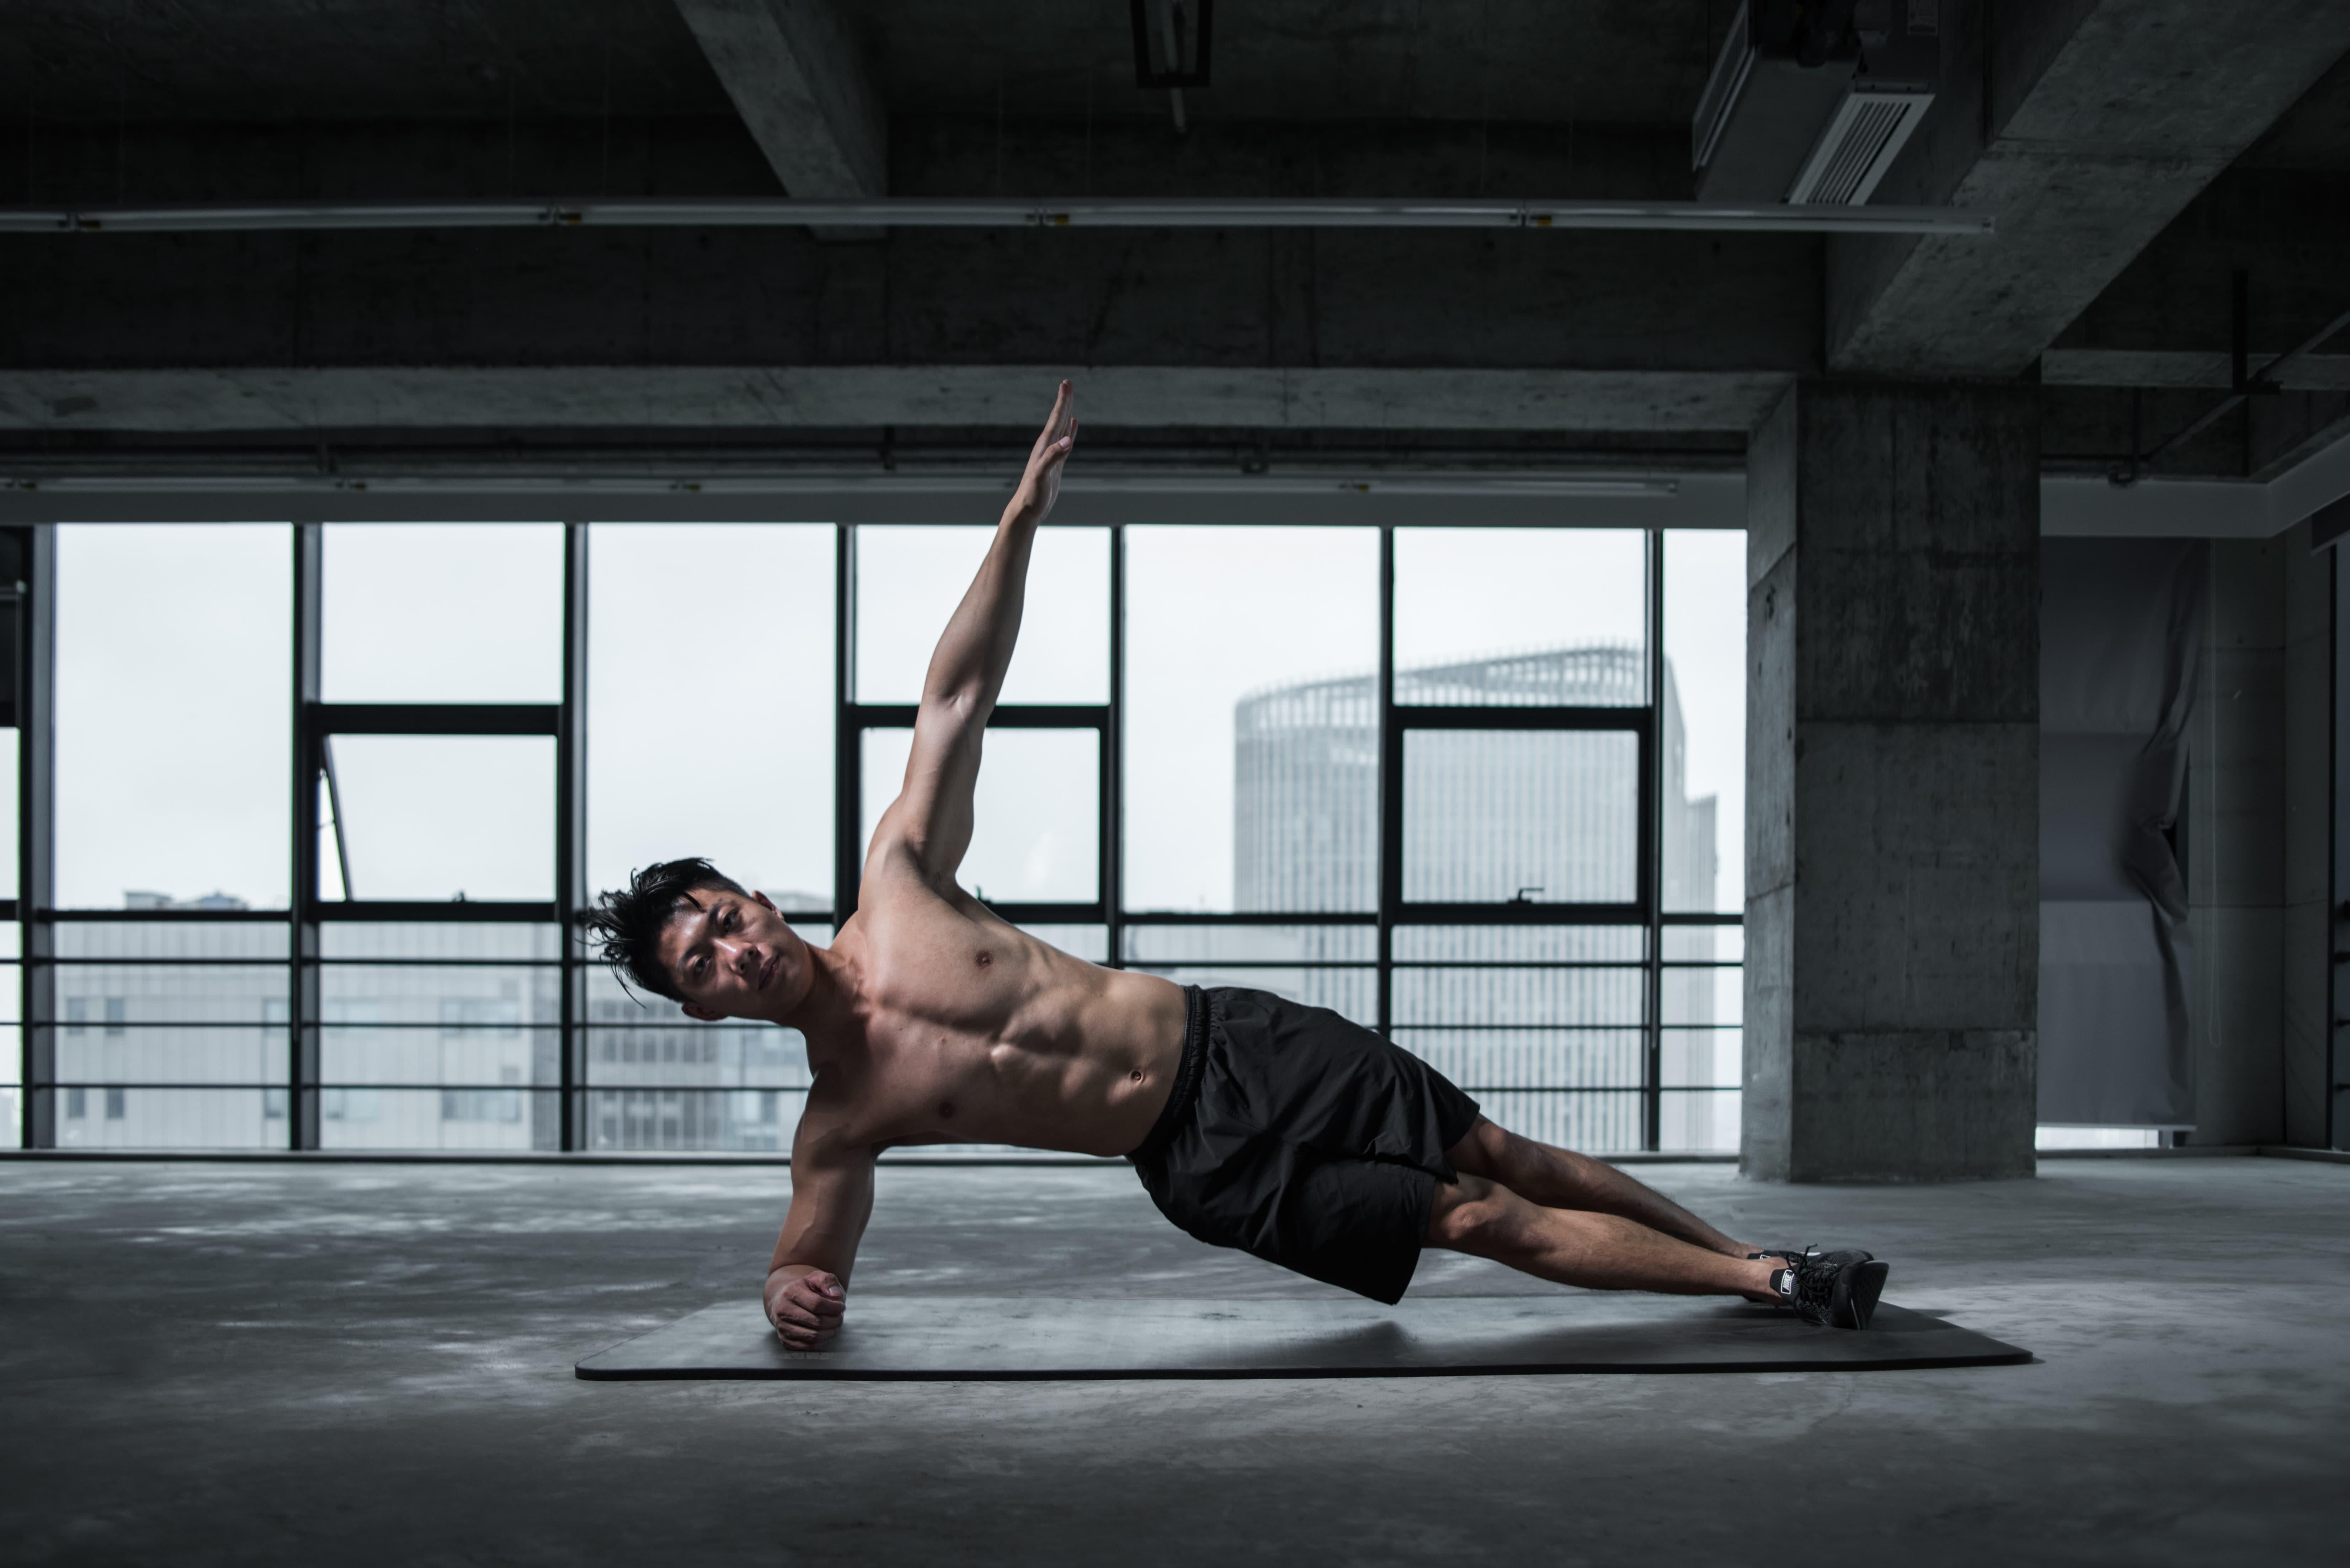 man in side plank position